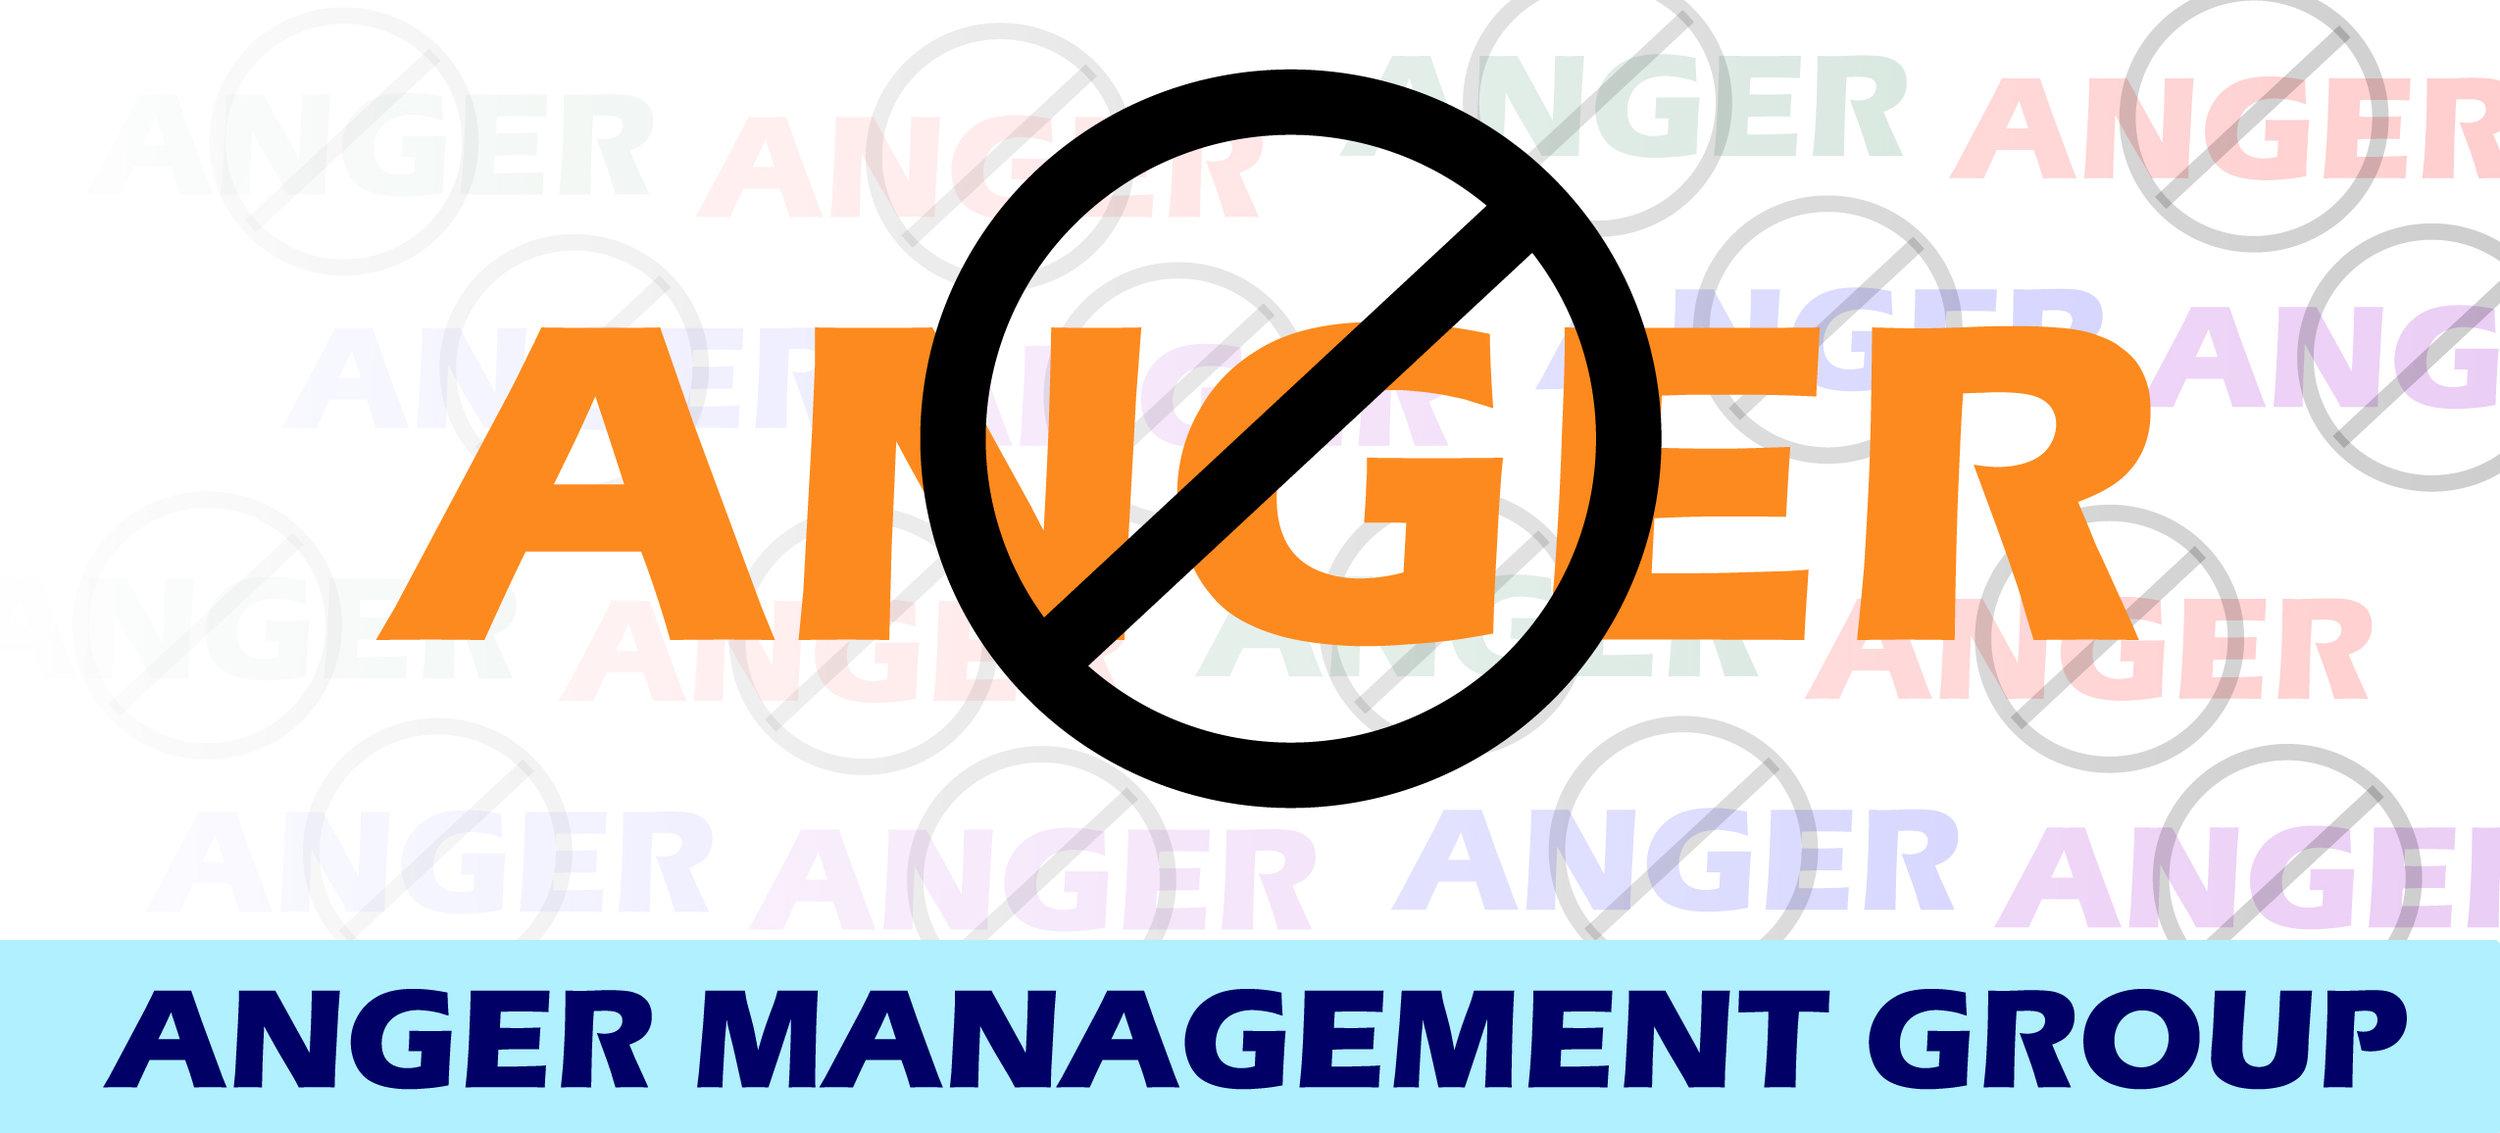 Anger Management Group header